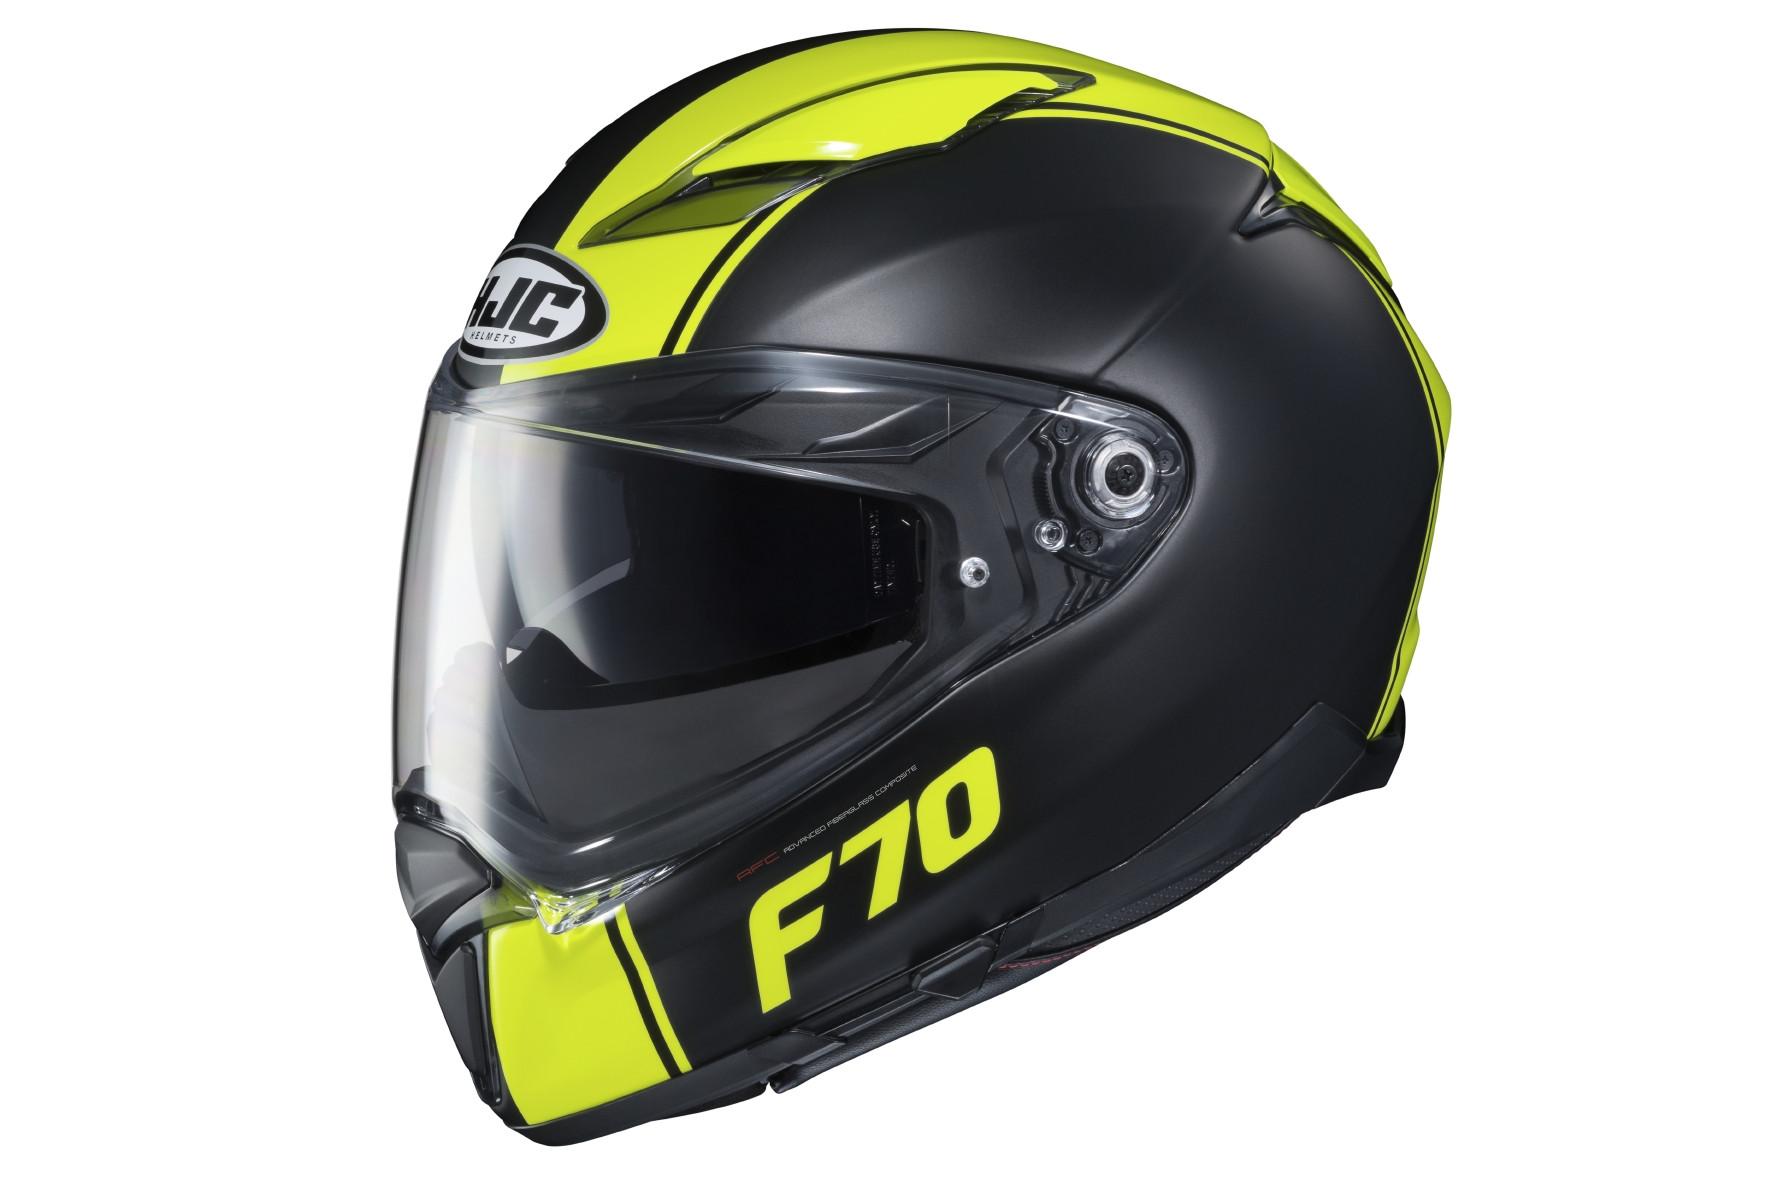 Nero//Giallo M Casco moto HJC F70 MAGO MC4HSF